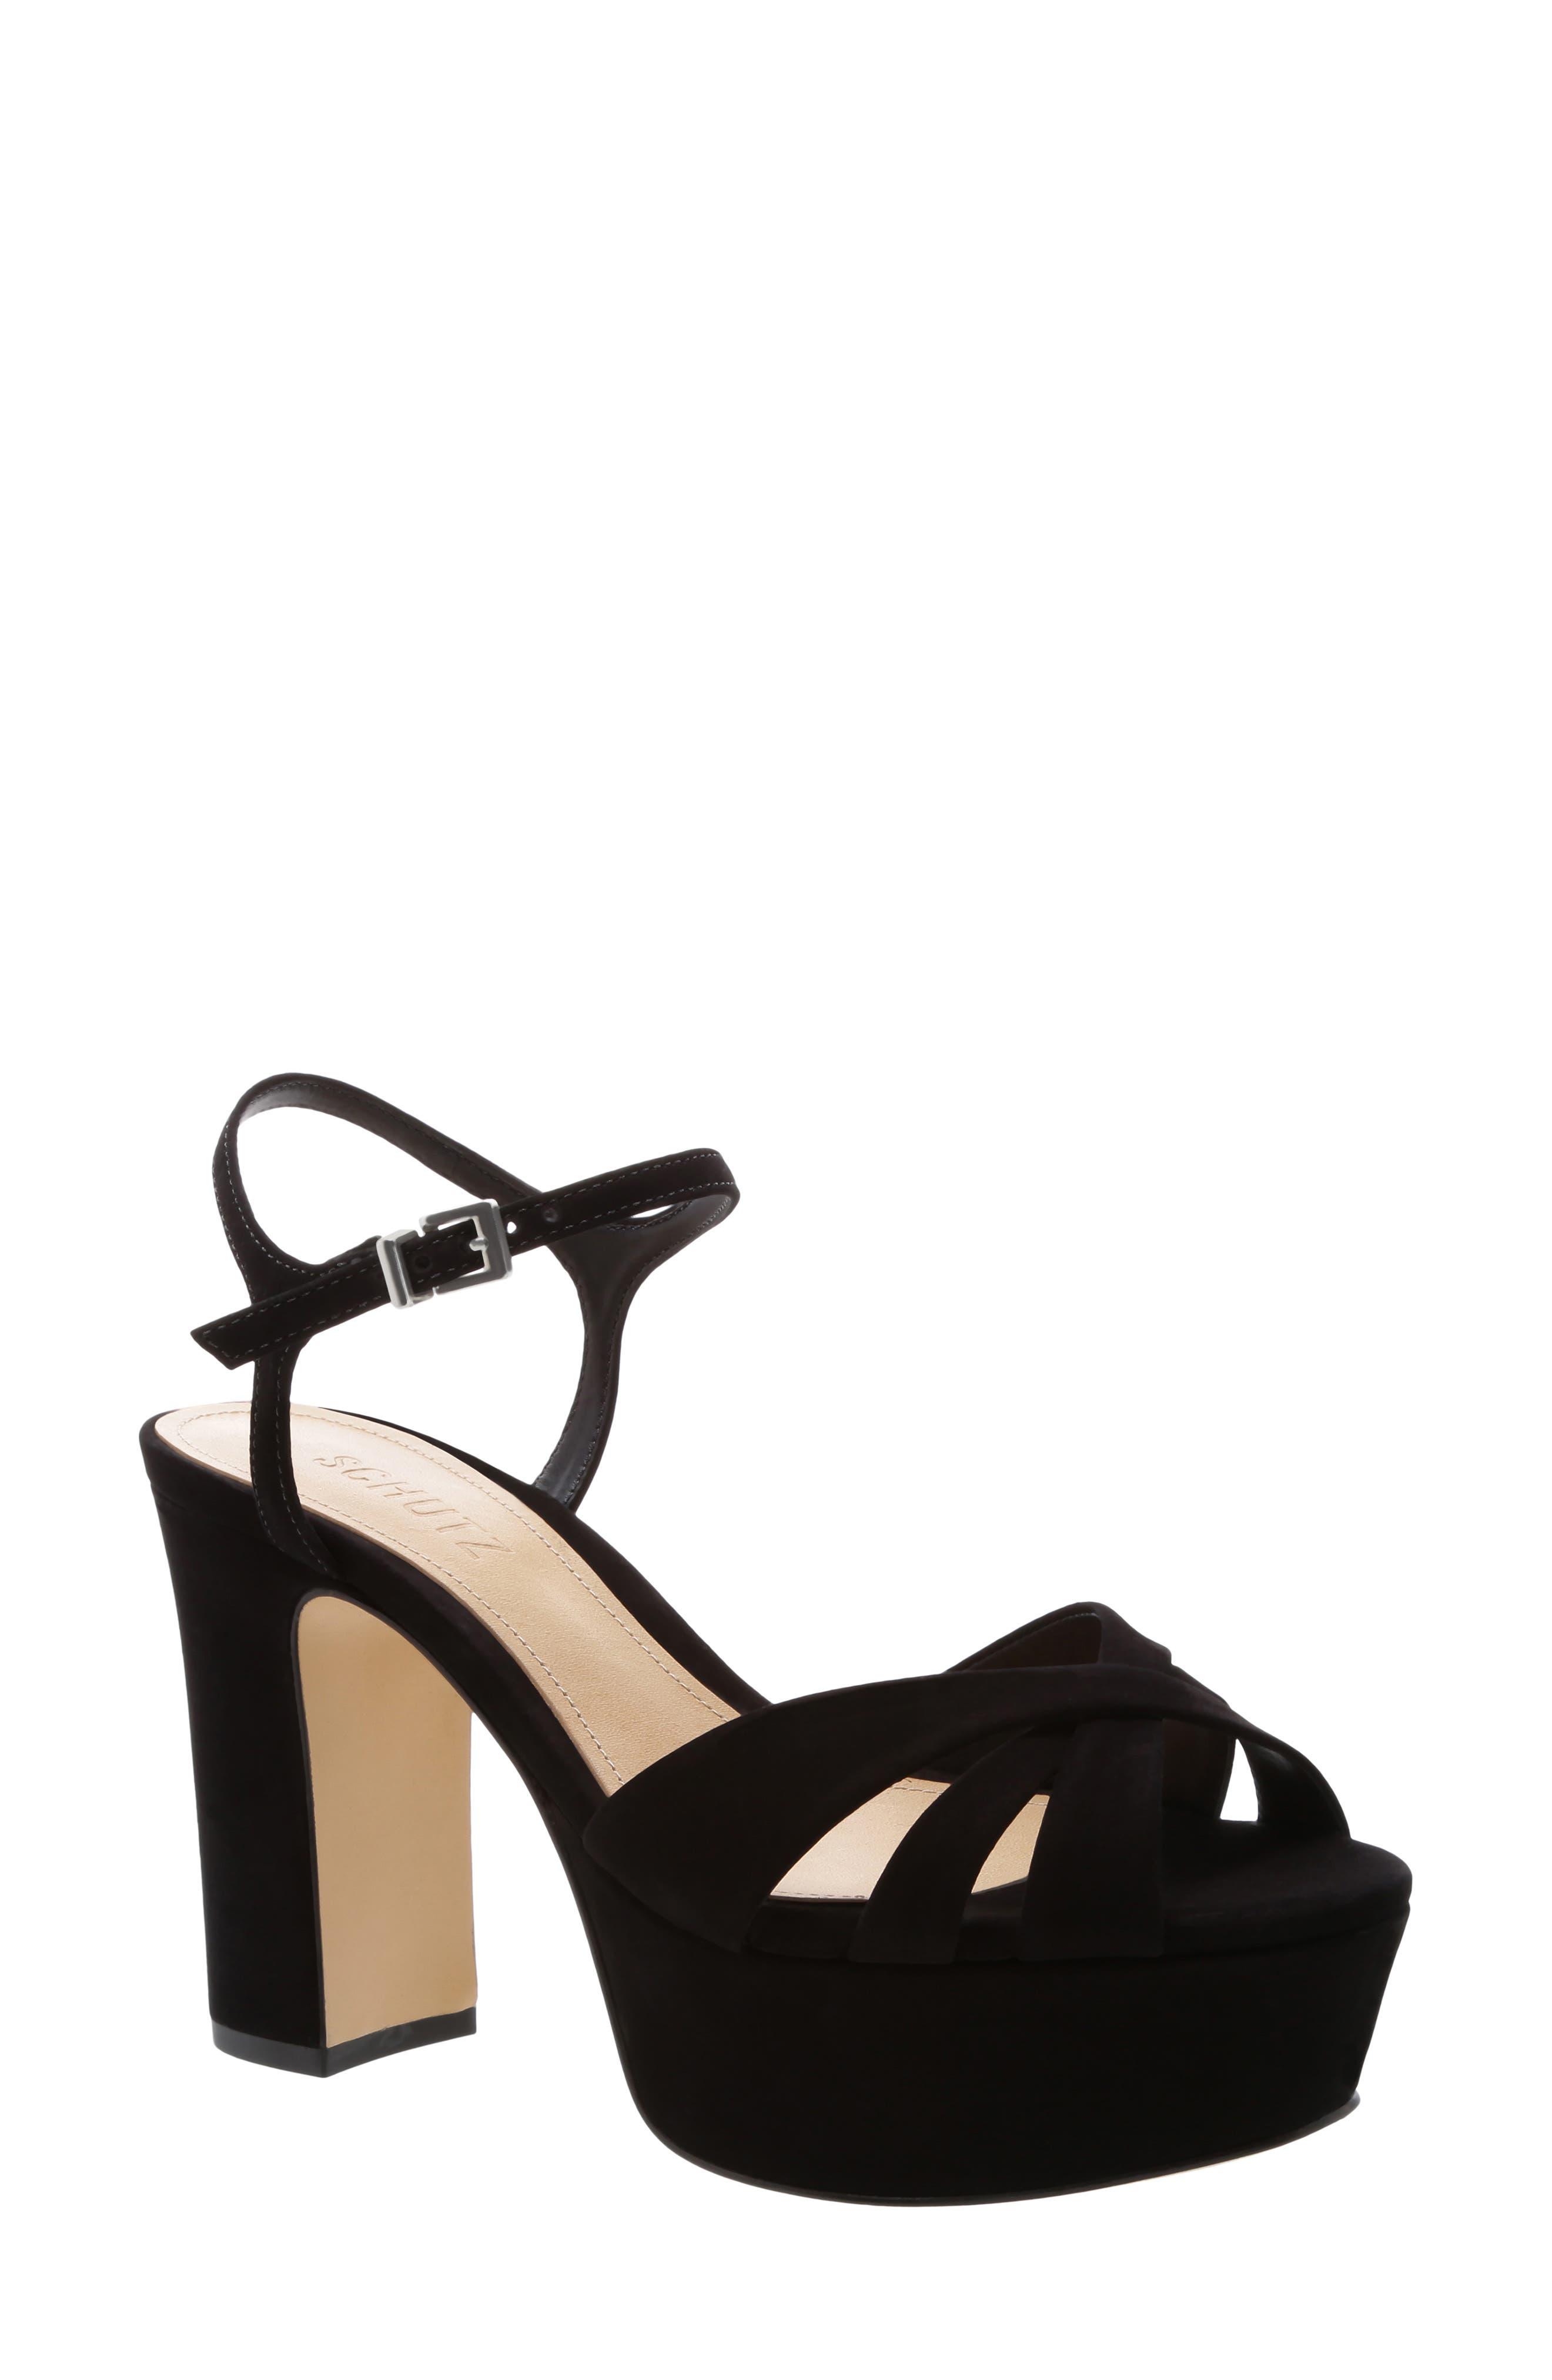 SCHUTZ, Keefa Platform Sandal, Main thumbnail 1, color, BLACK NUBUCK LEATHER